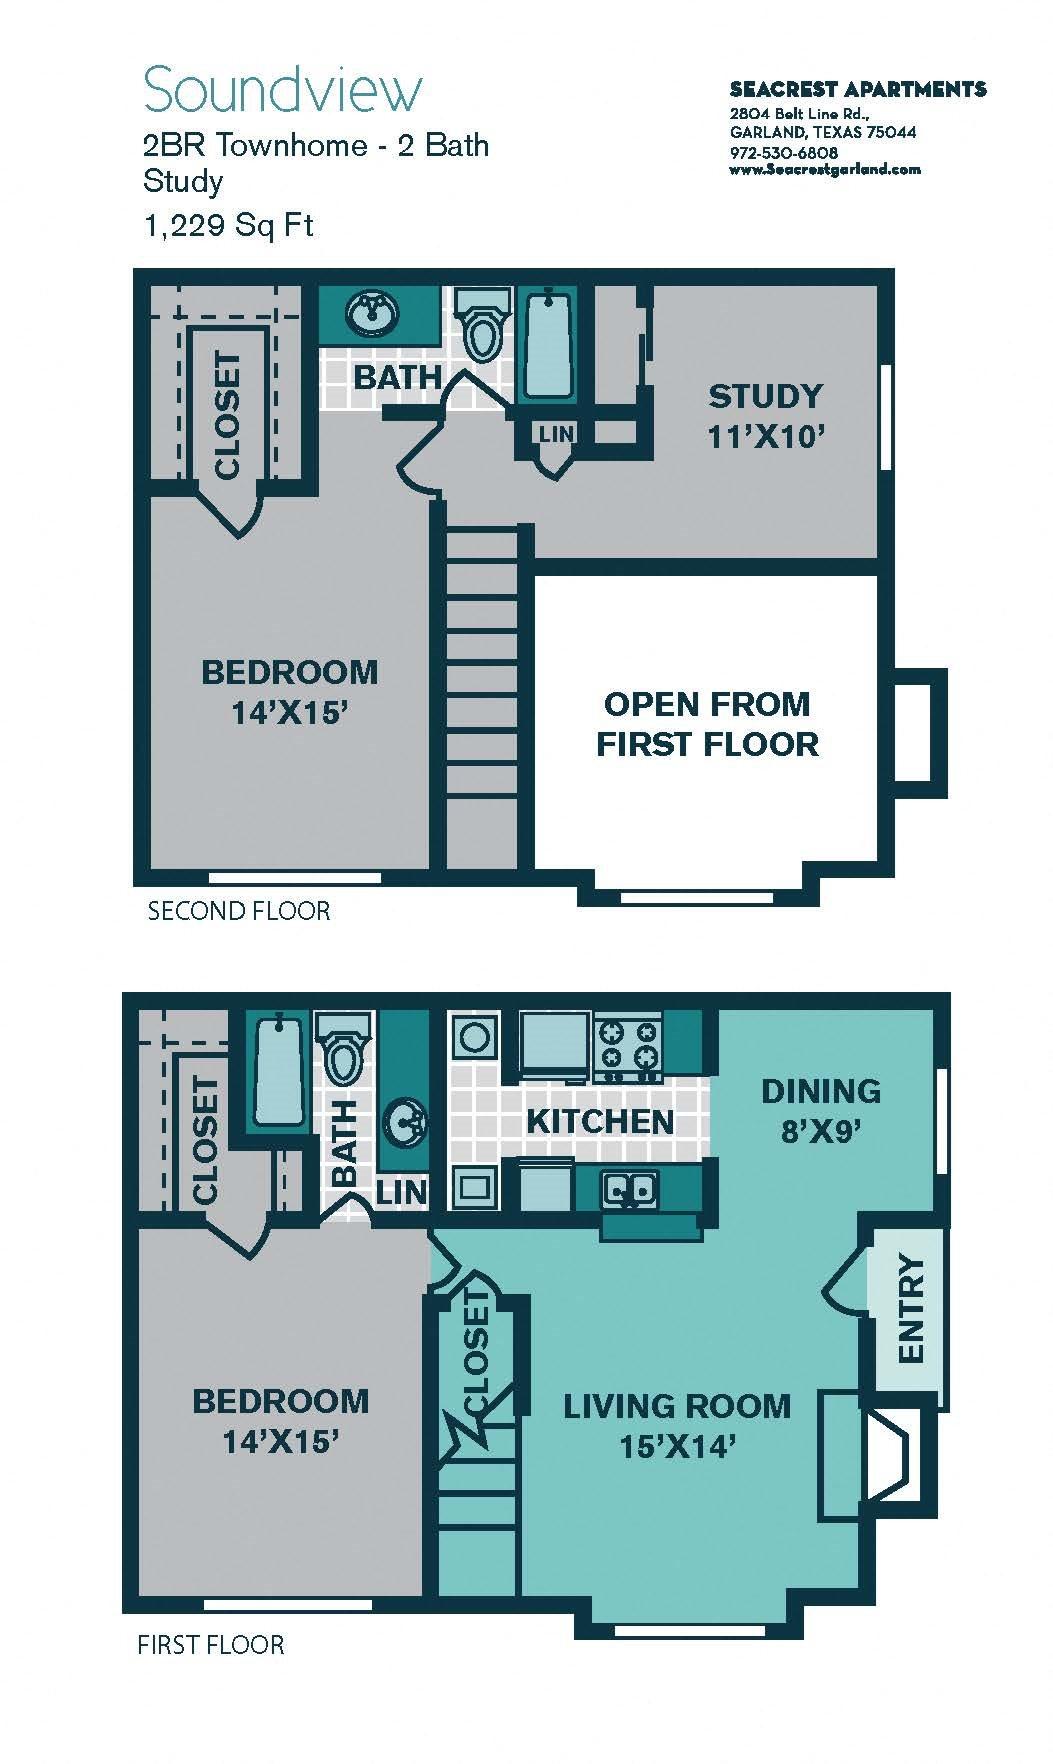 2 Bed/ 2 Bath B3 - 1229sqft - SOUNDVIEW Floor Plan 11